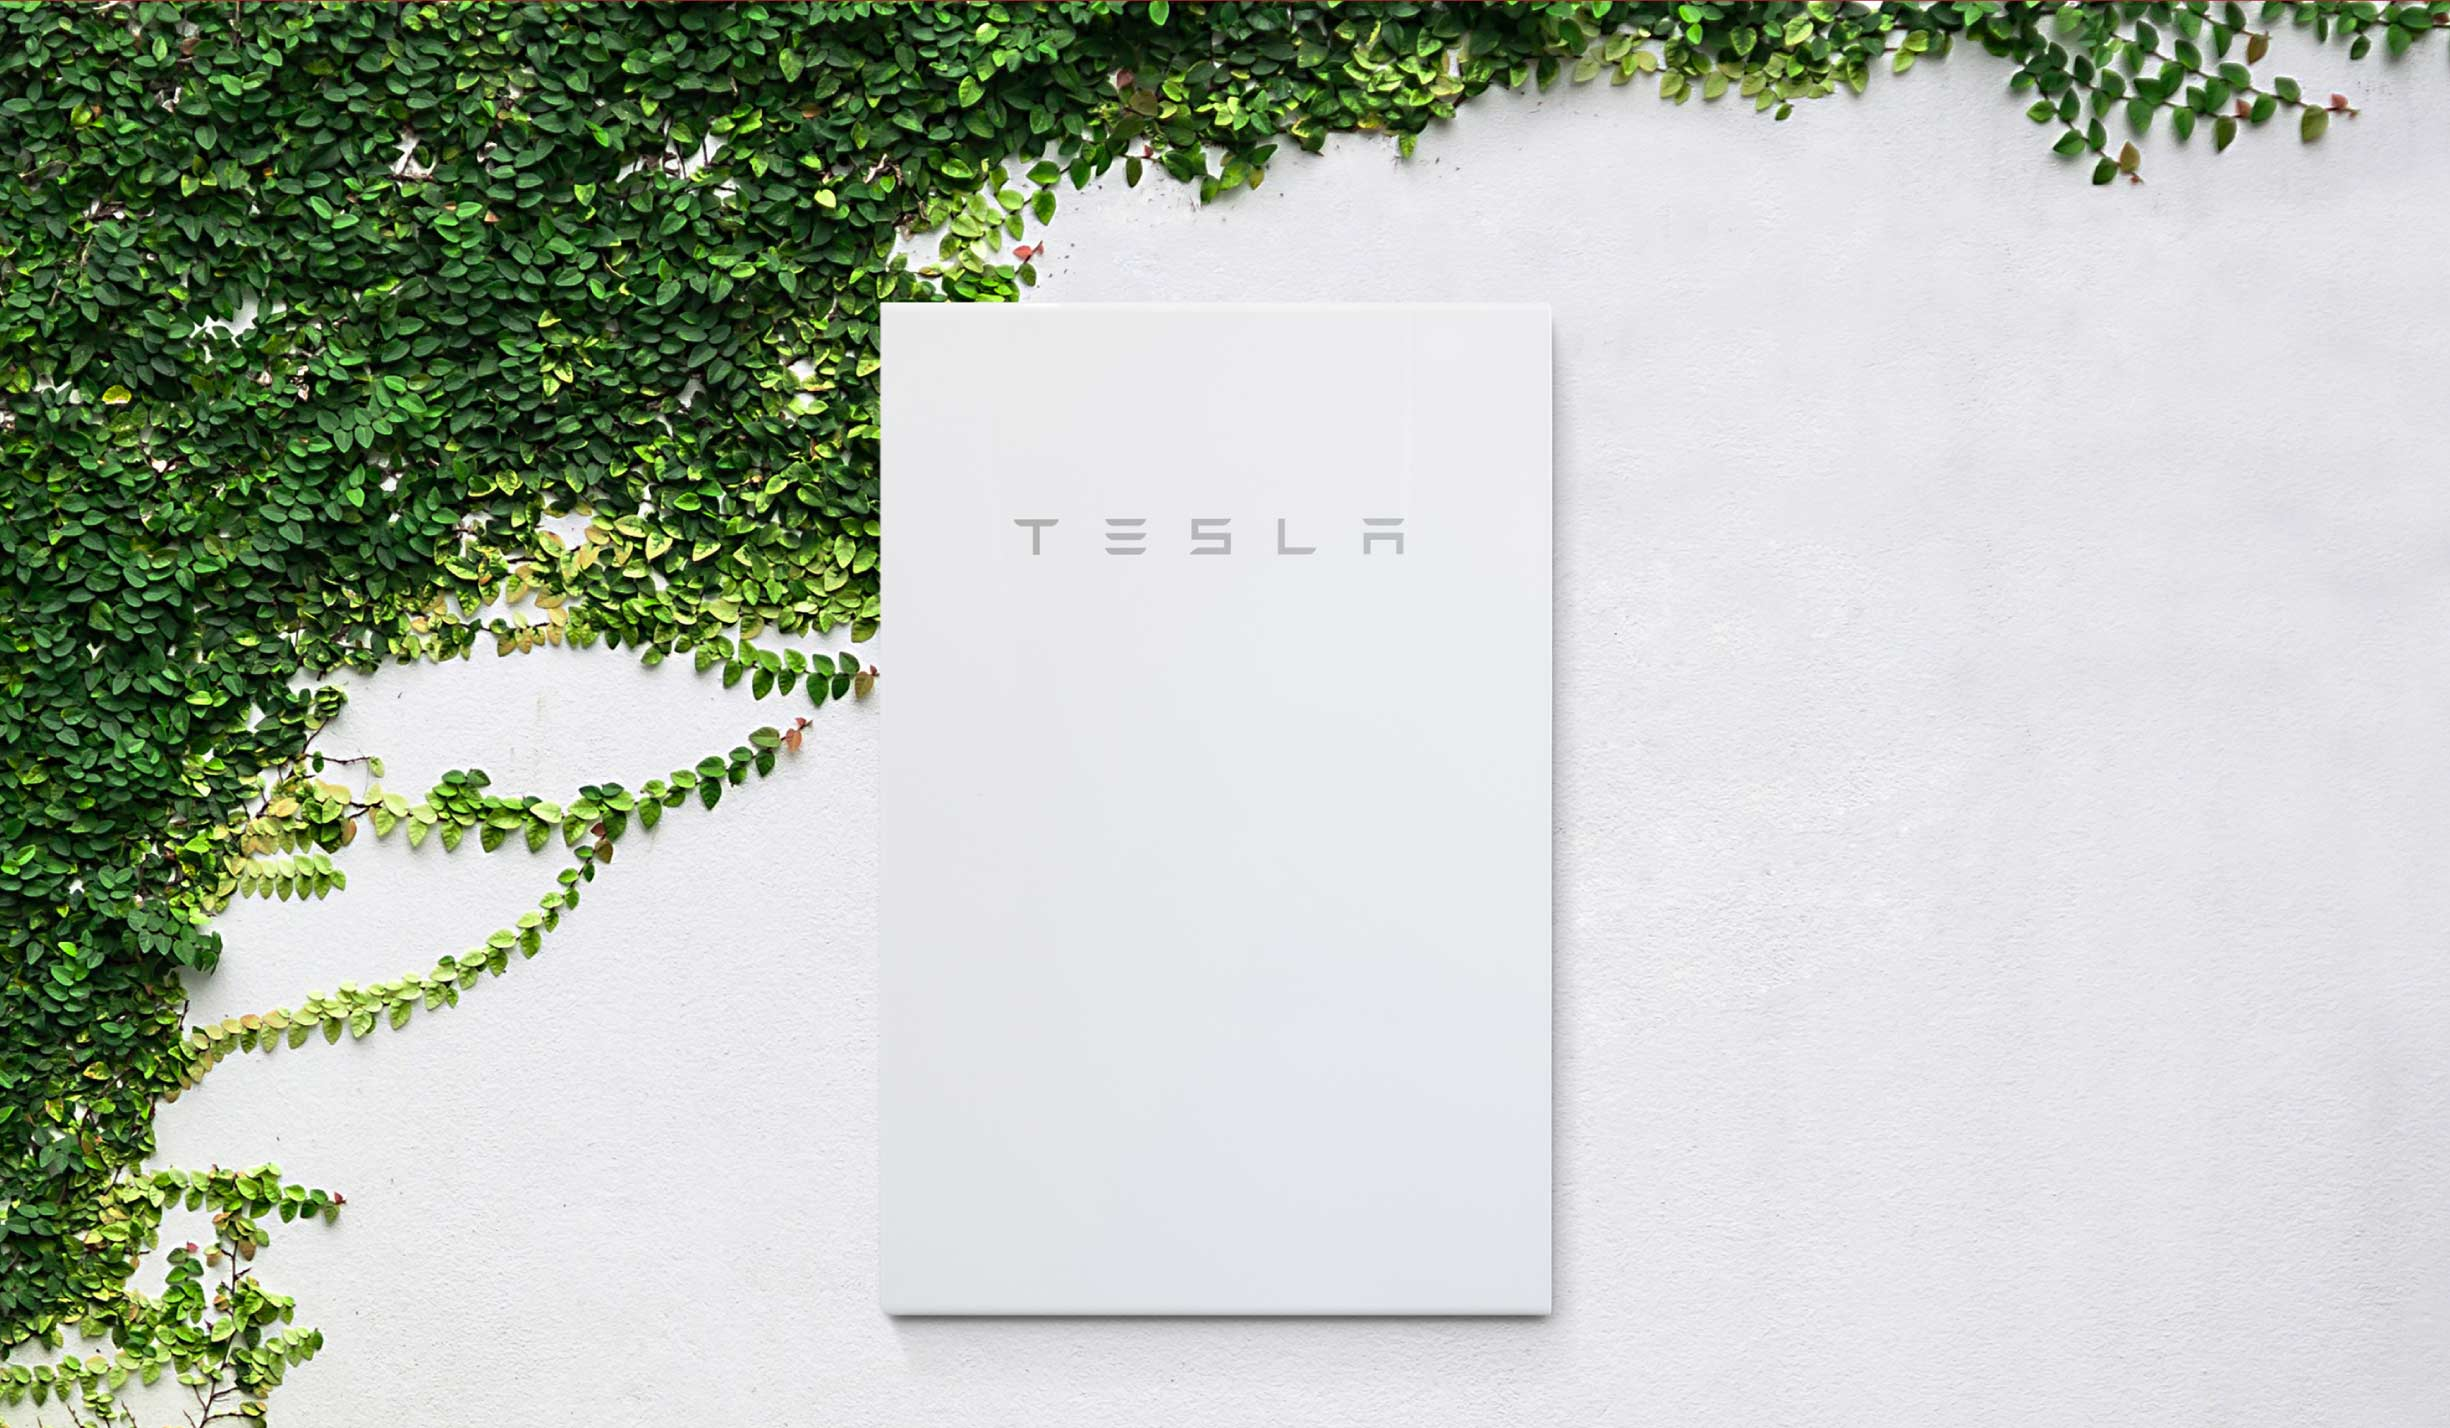 tesla-background-4 Free Tesla Powerwall Promotion